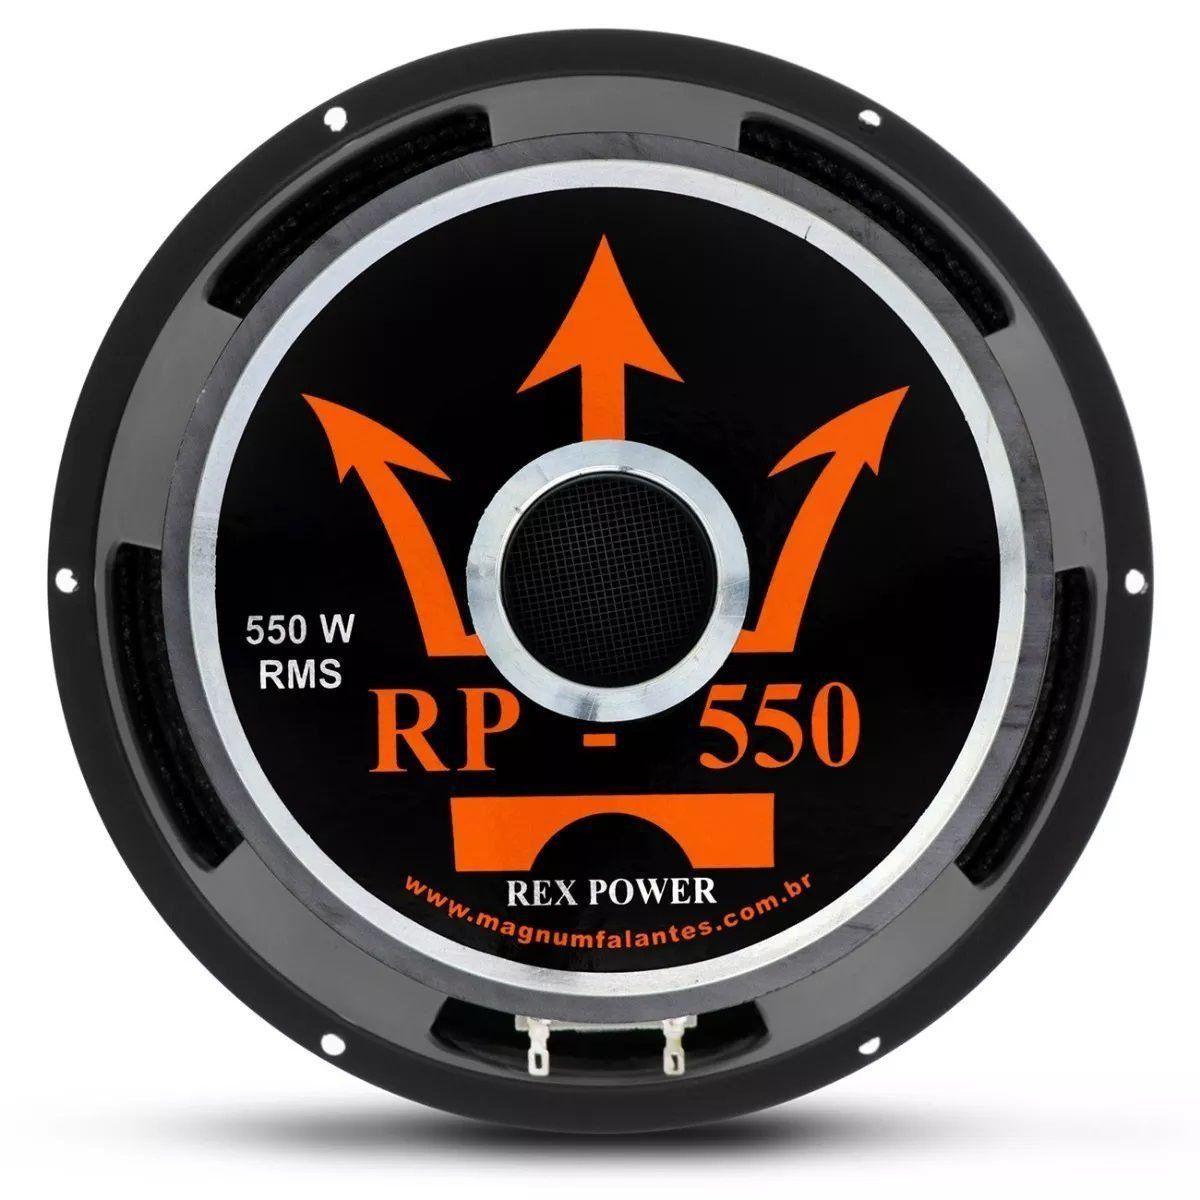 Falante Woofer 12 Pol 550w Rms 4 Ohms Magnum Rex Power